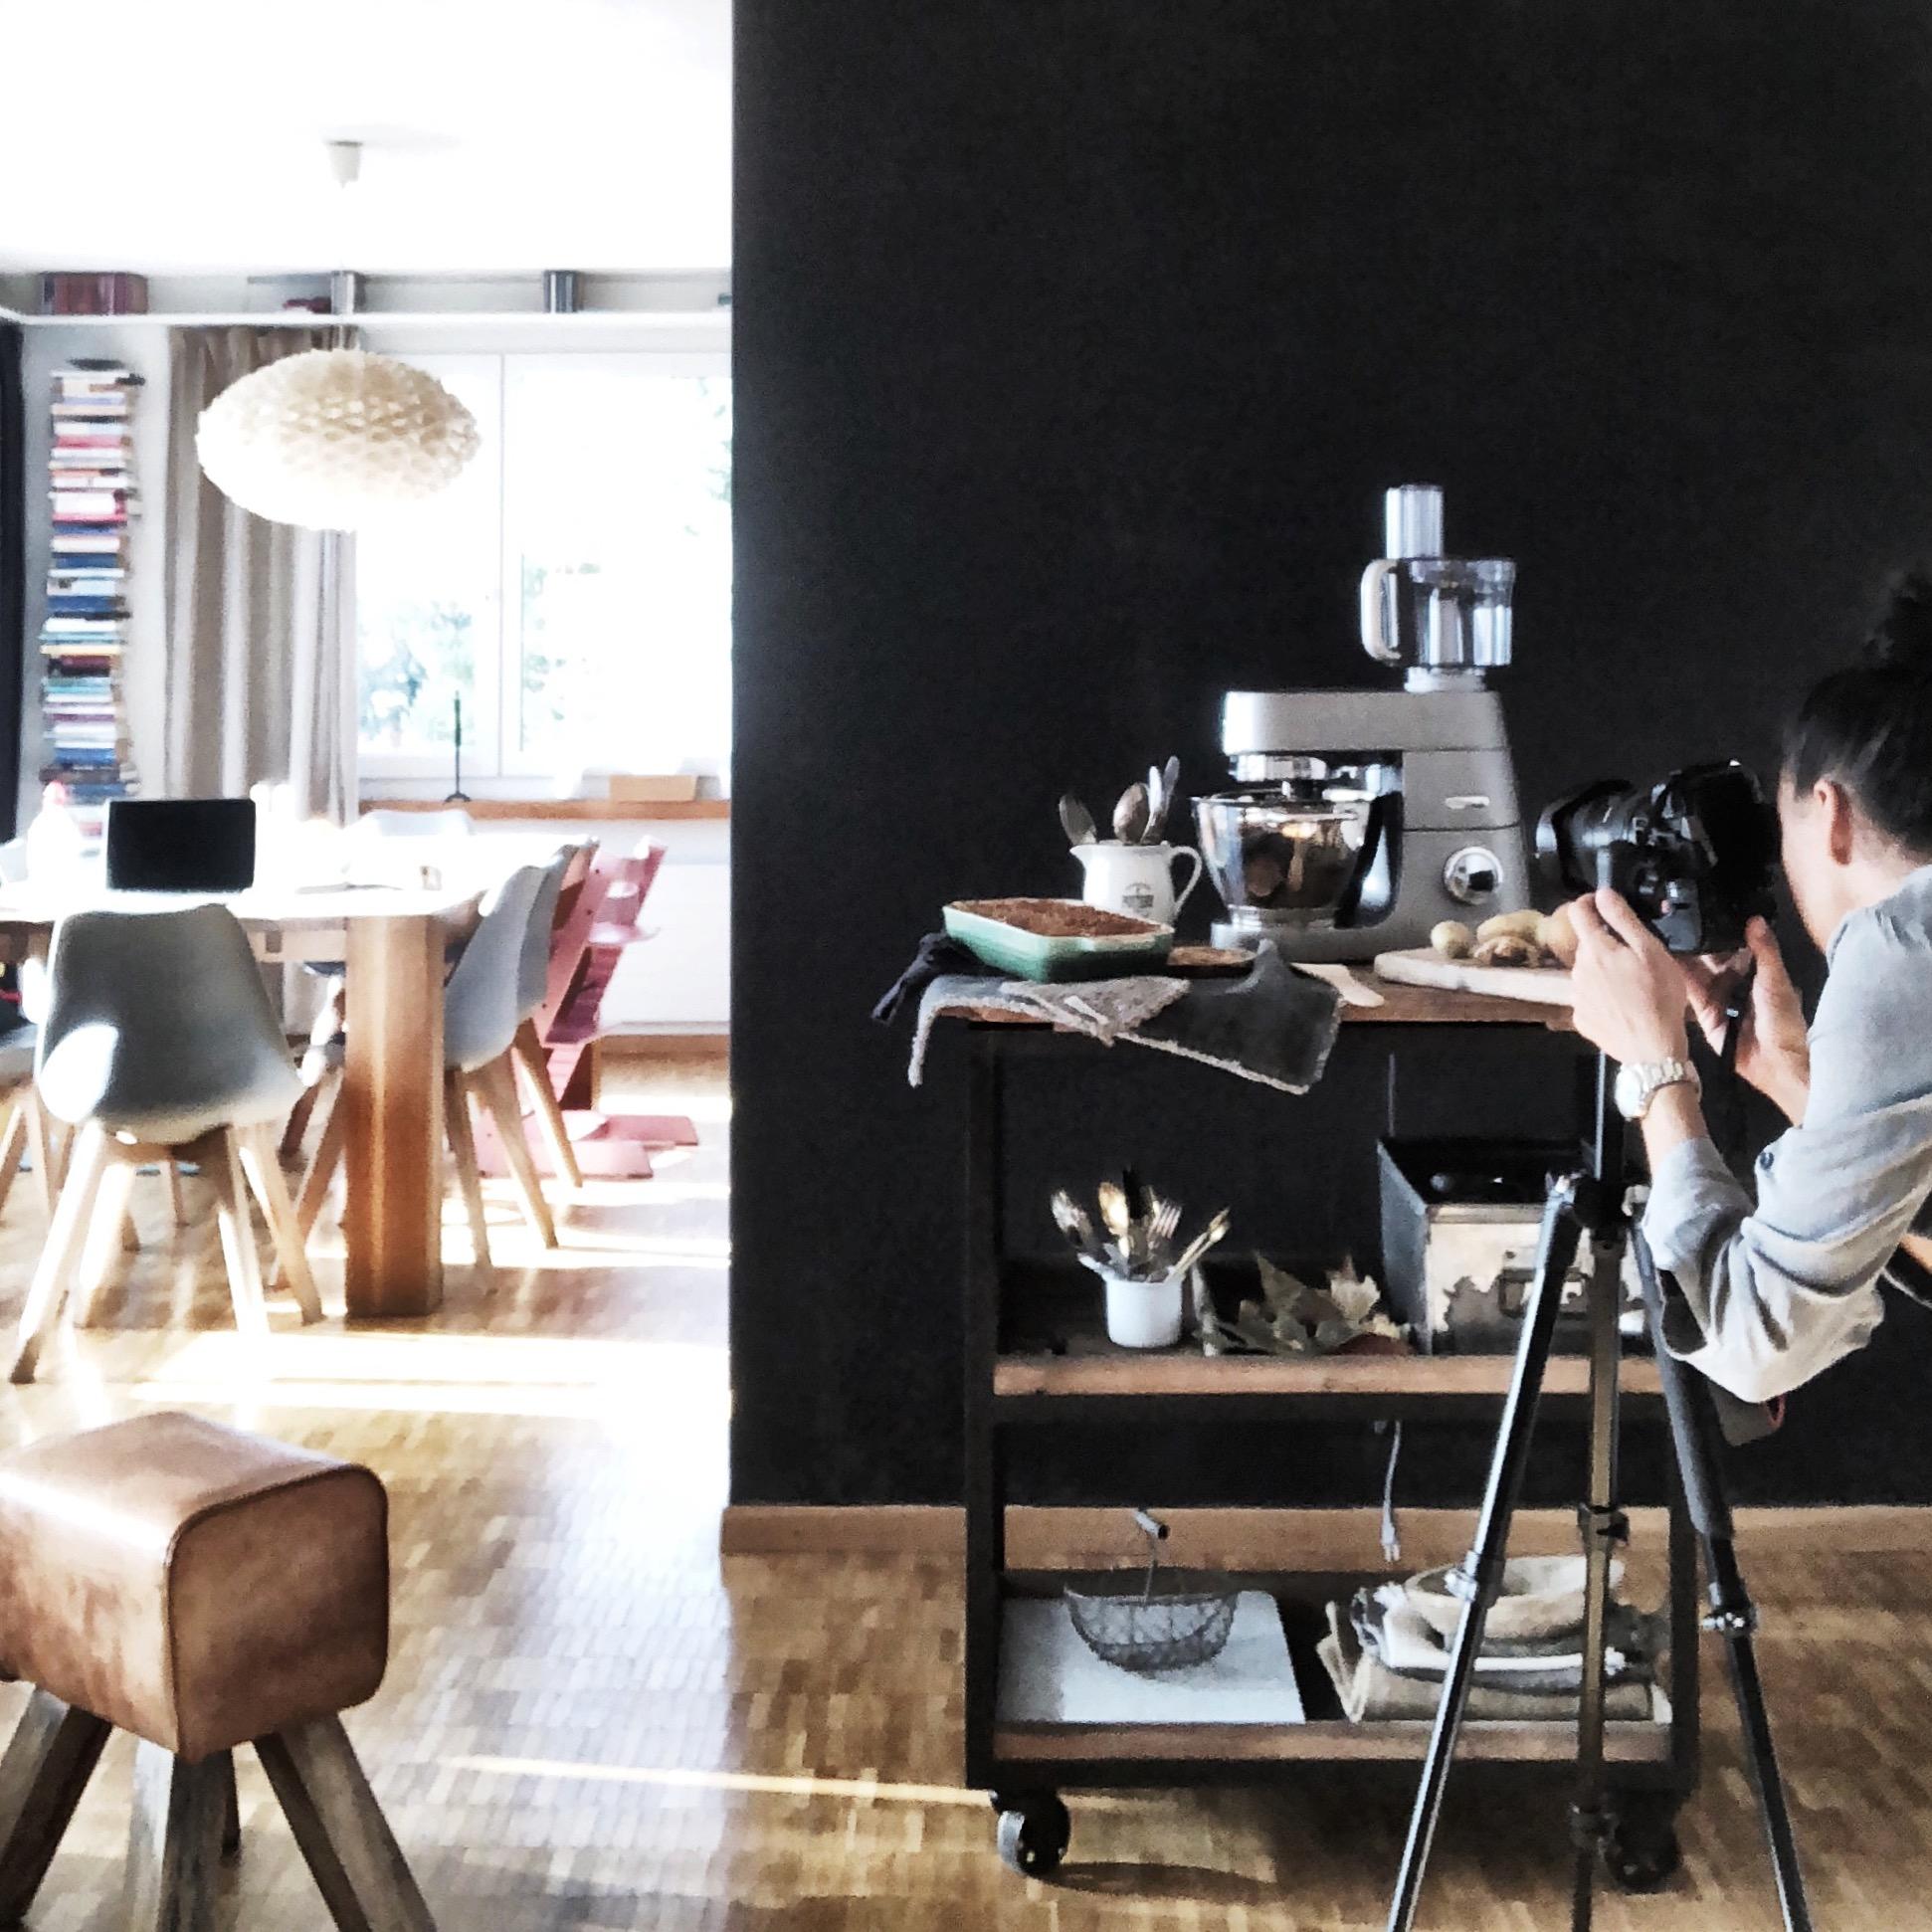 Foodblog Behind the scenes